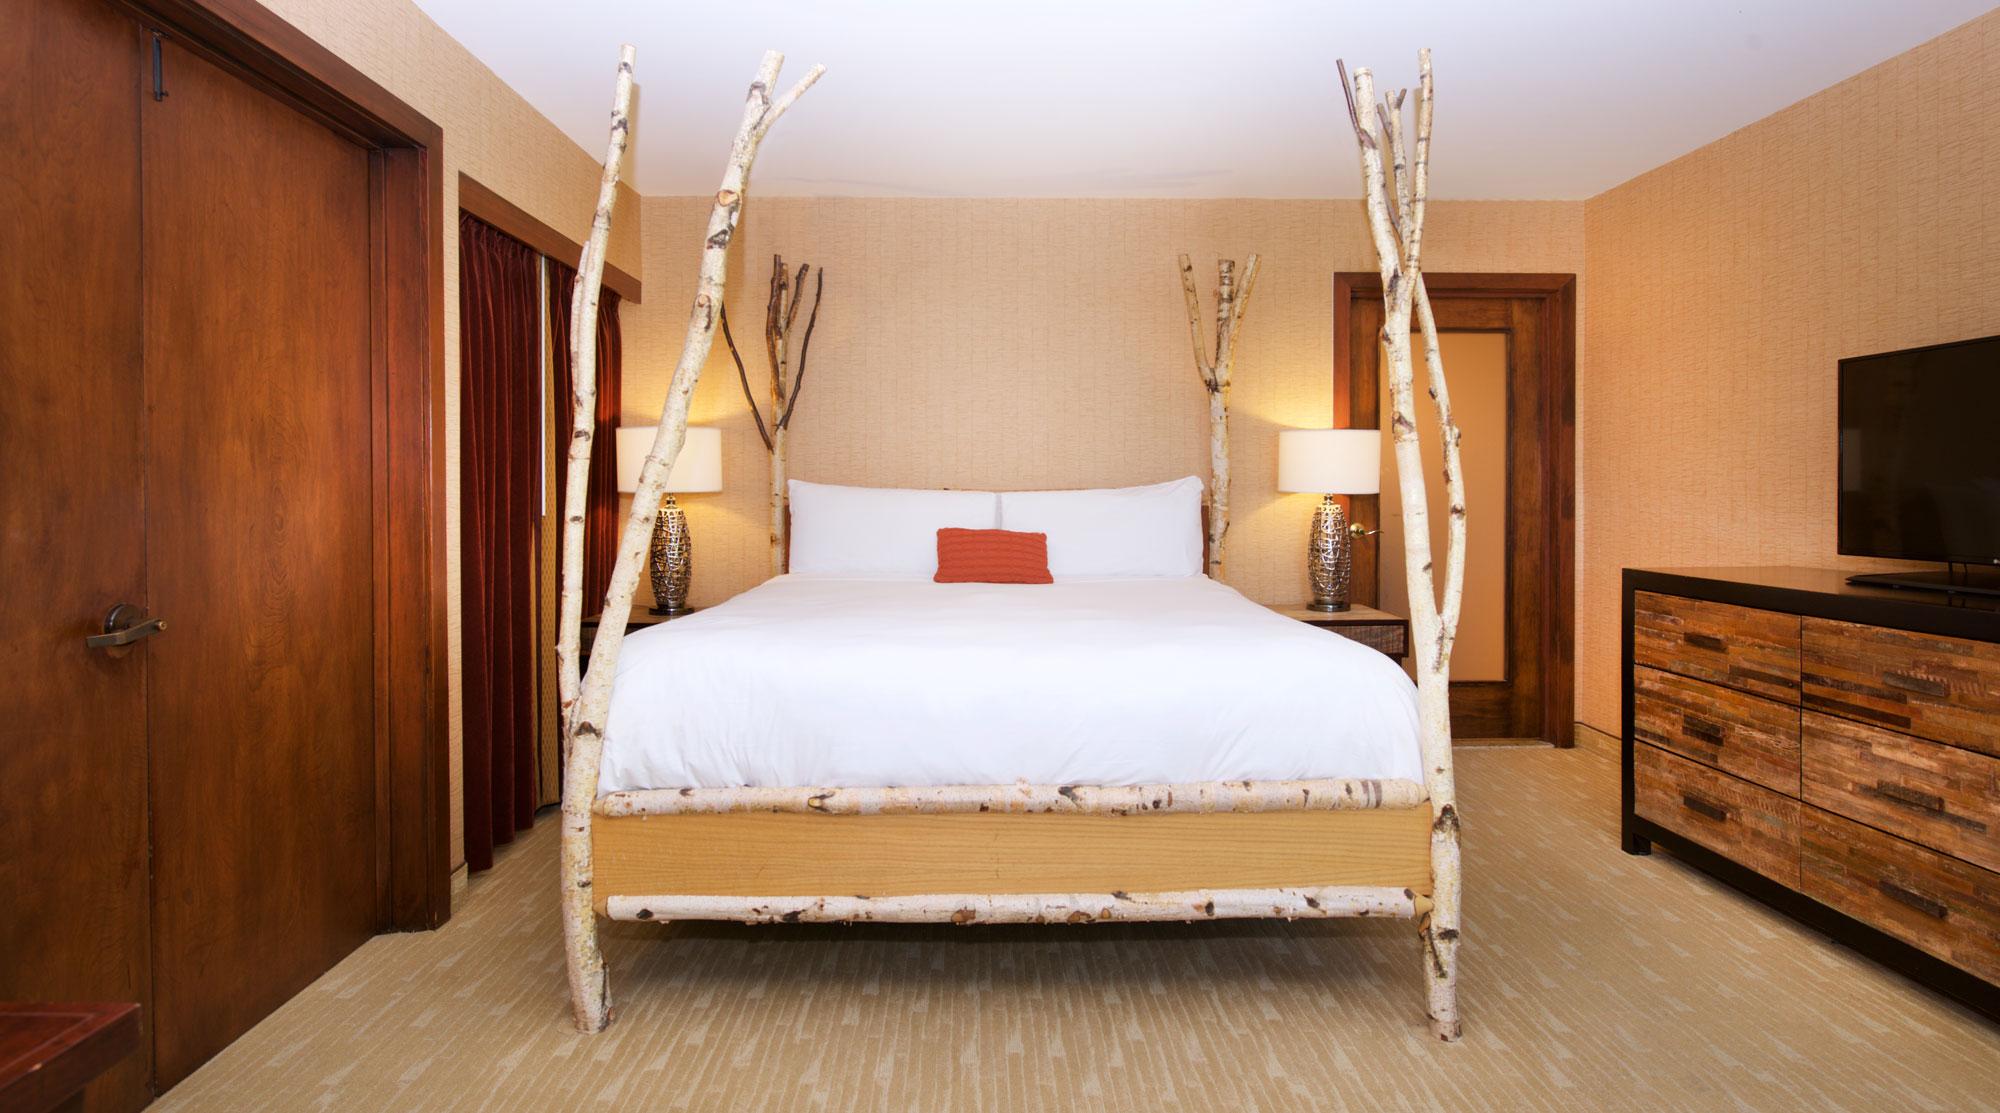 California S Legendary Lake Arrowhead Resort Spa Joins Benchmark Resorts Hotels Management Portfolio